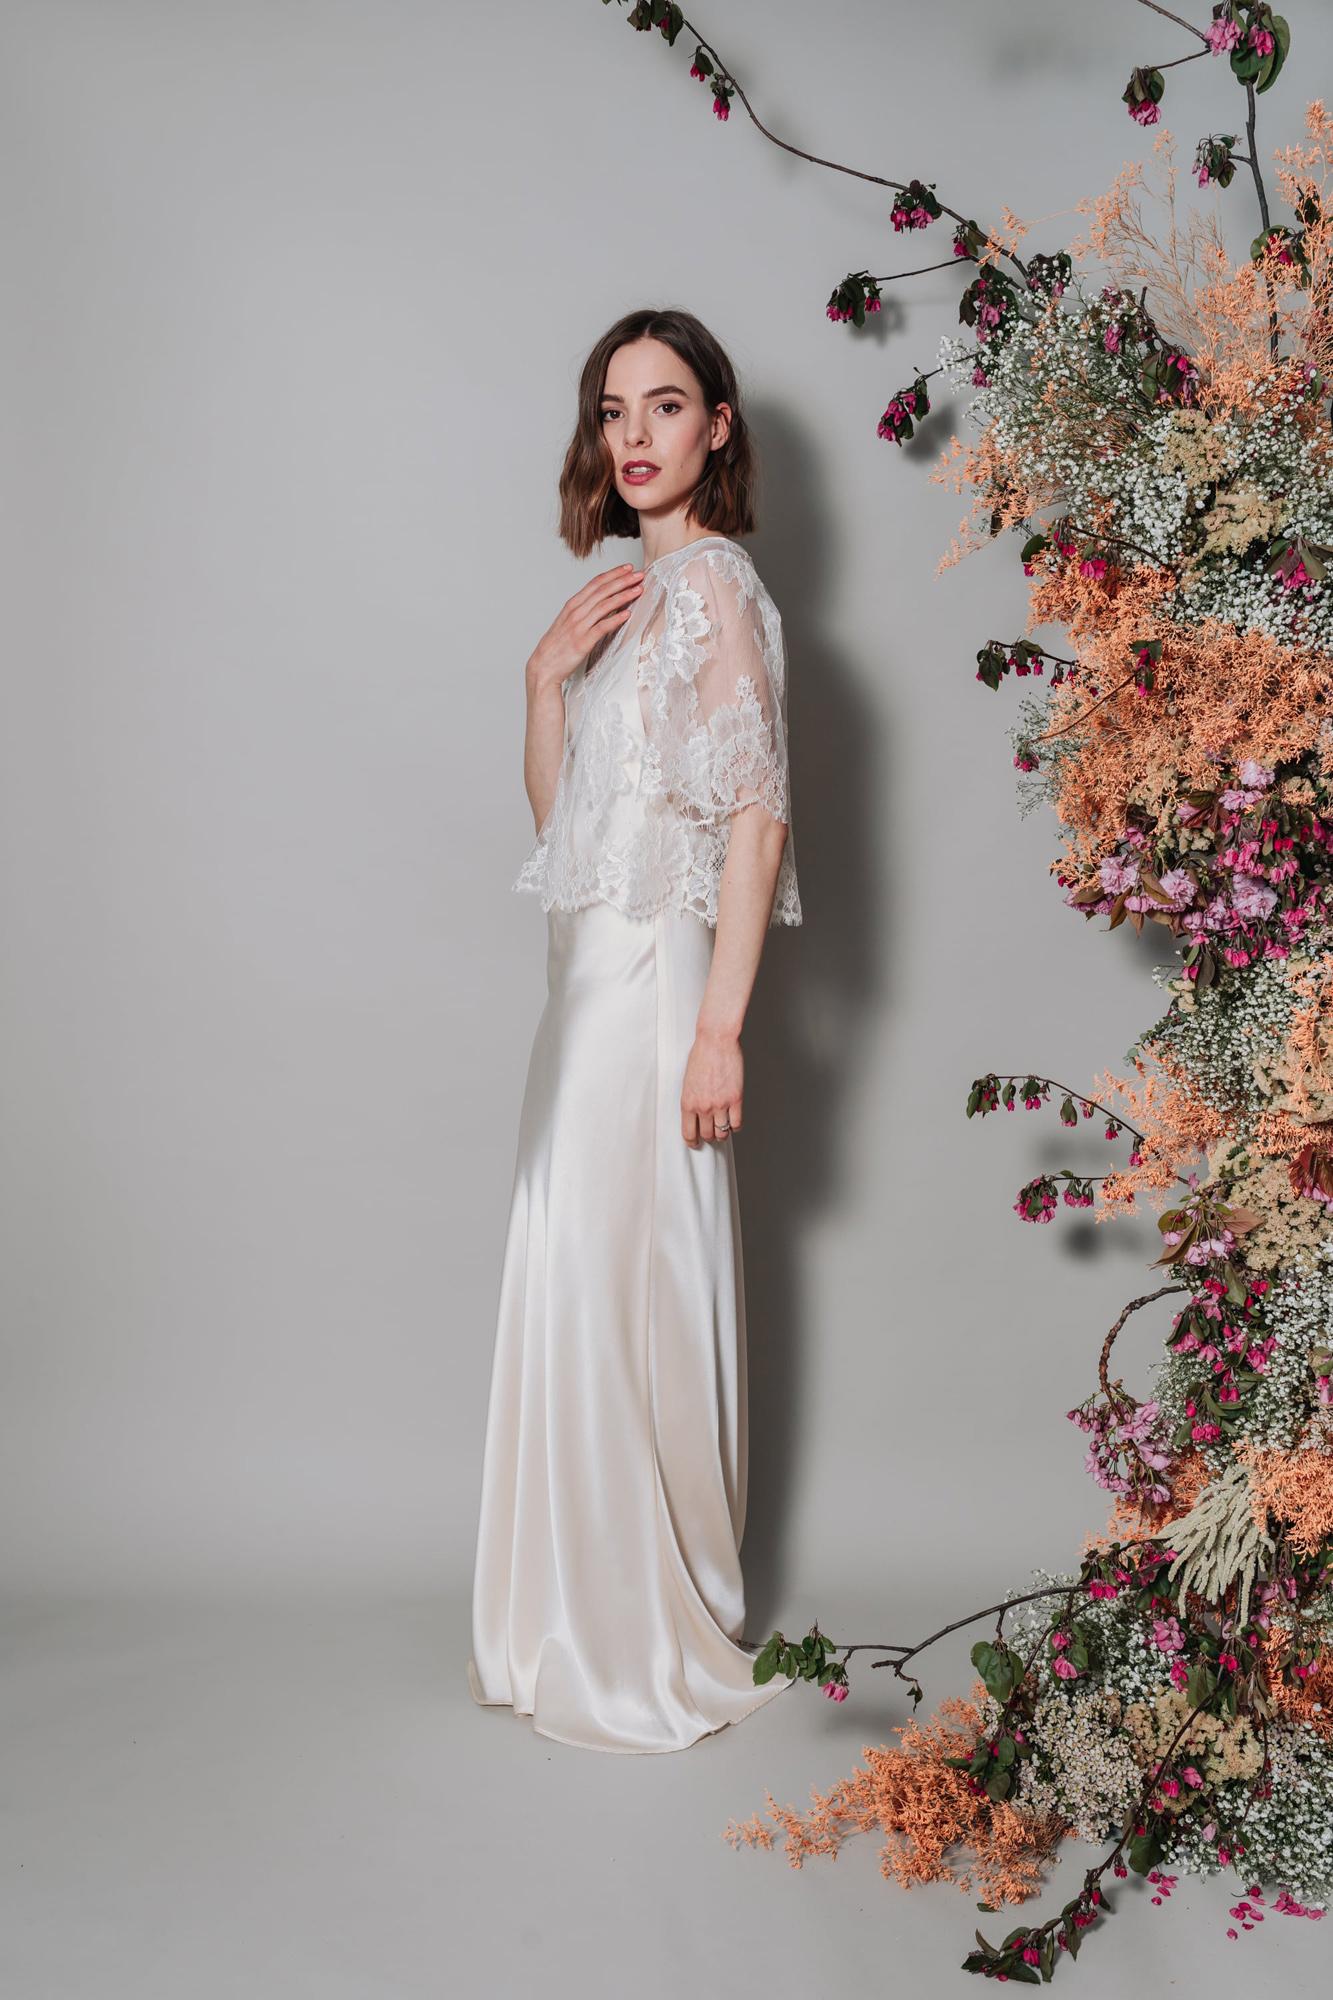 Kate-Beaumont-Sheffield-Rosa-Floral-Lace-Jacket-Camellia-Bias-Cut-Silk-Wedding-Gown-3.jpg